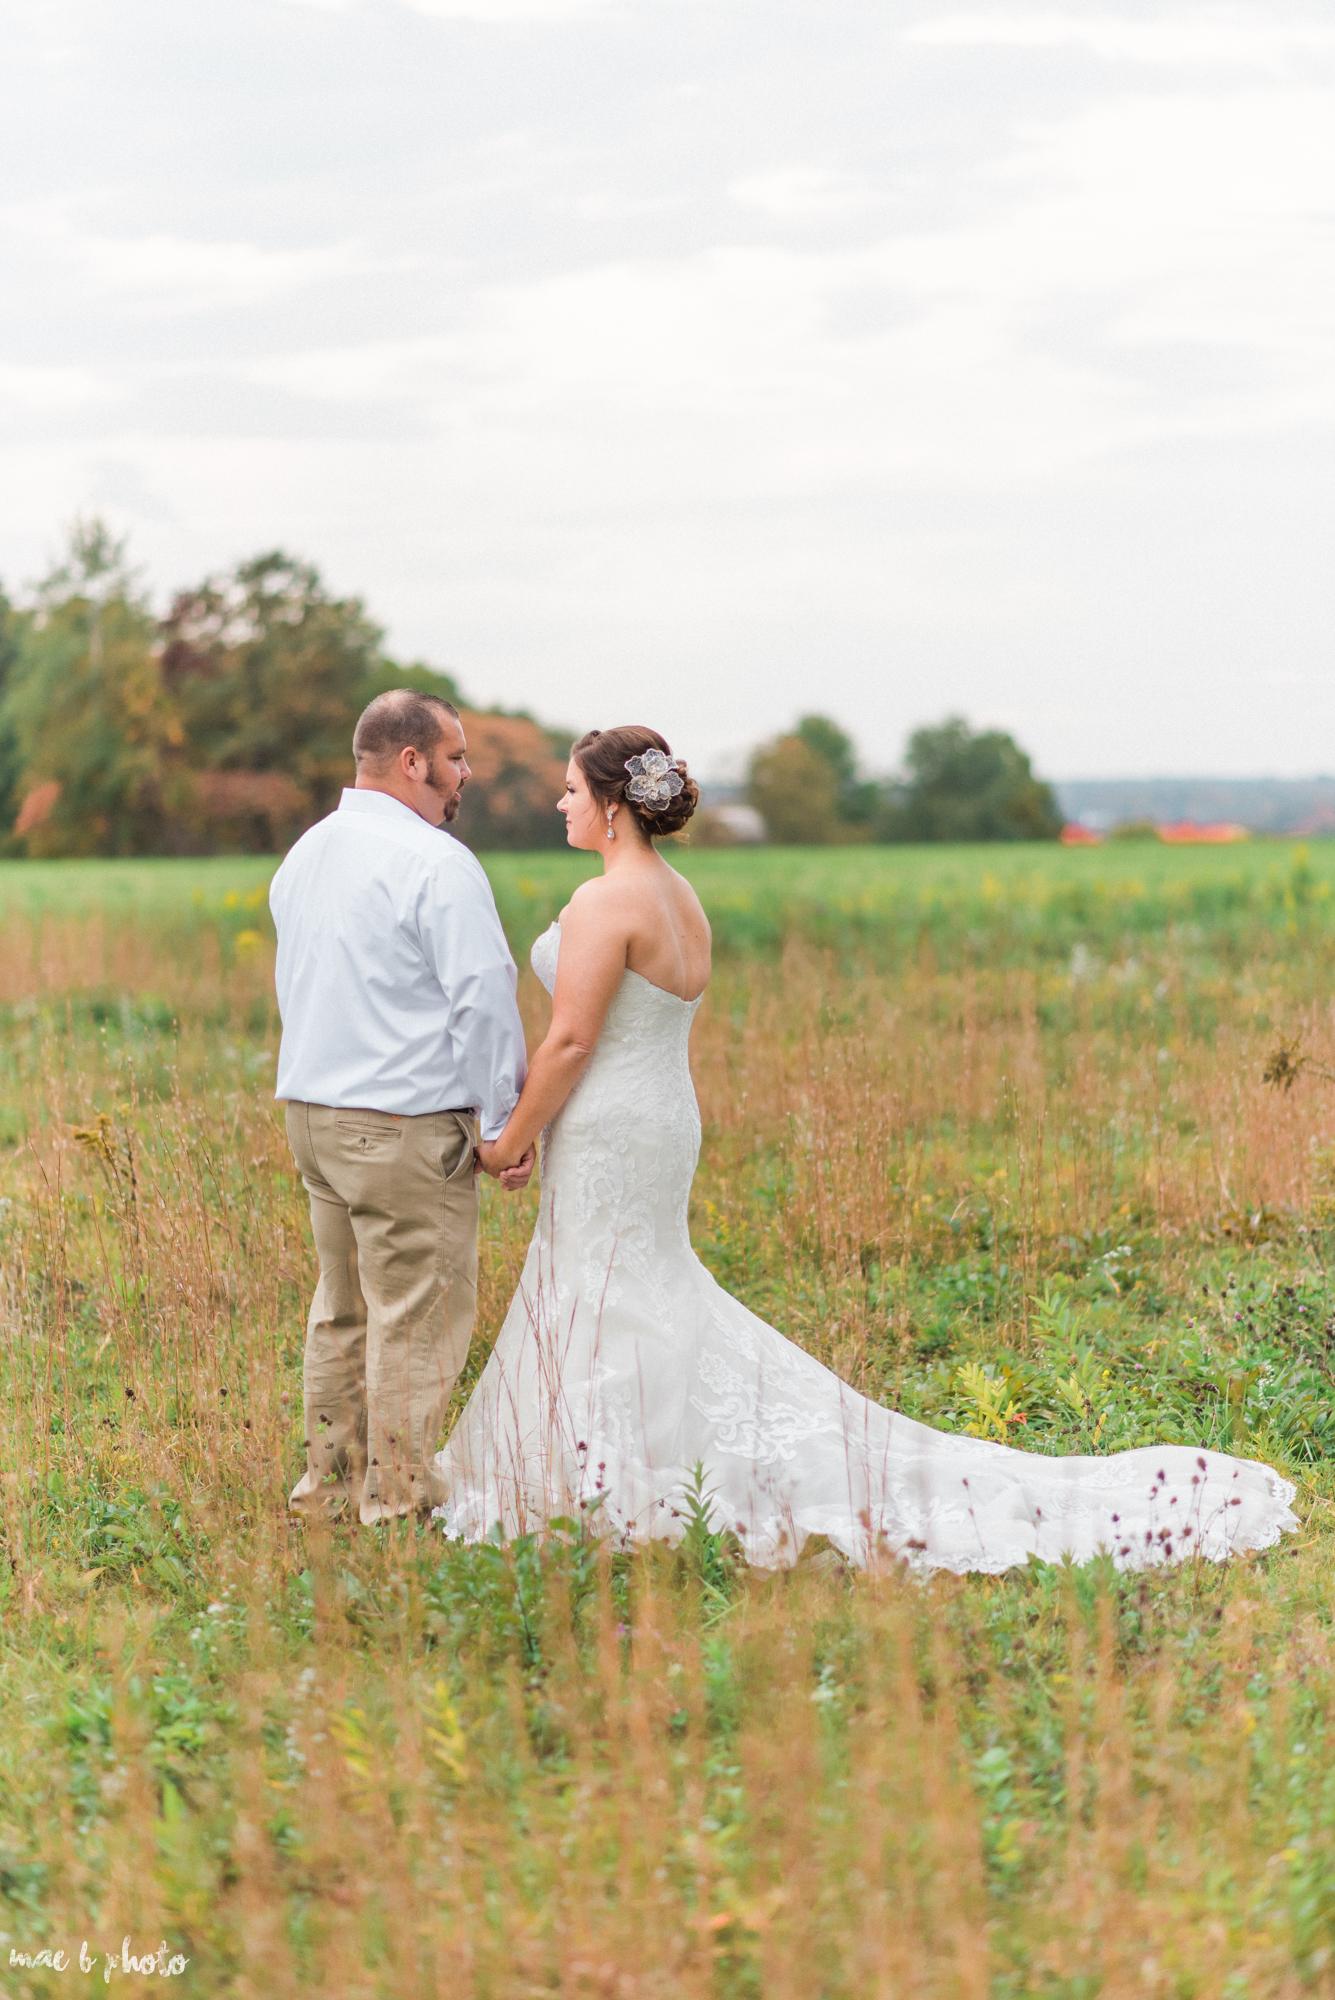 Sarah & Dustin's Rustic Chic Barn Wedding at Hartford Hill Winery in Hartford, Ohio by Mae B Photo-74.jpg